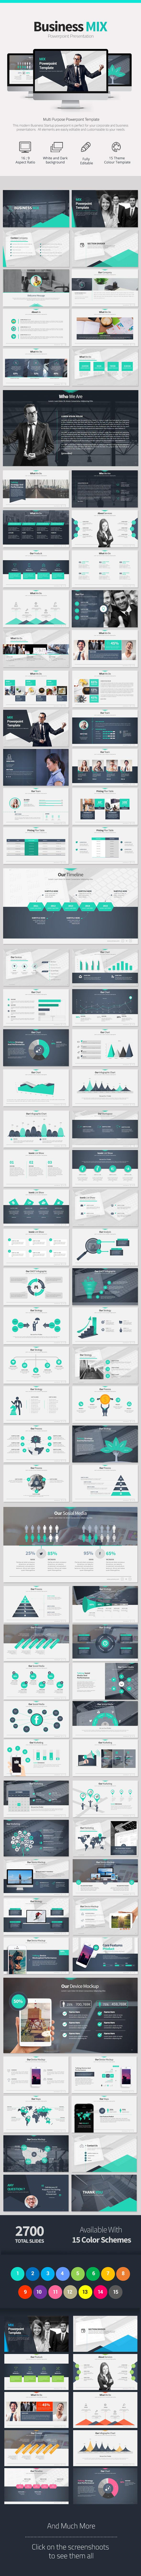 Business Mix PowerpointPresentation - Creative PowerPoint Templates